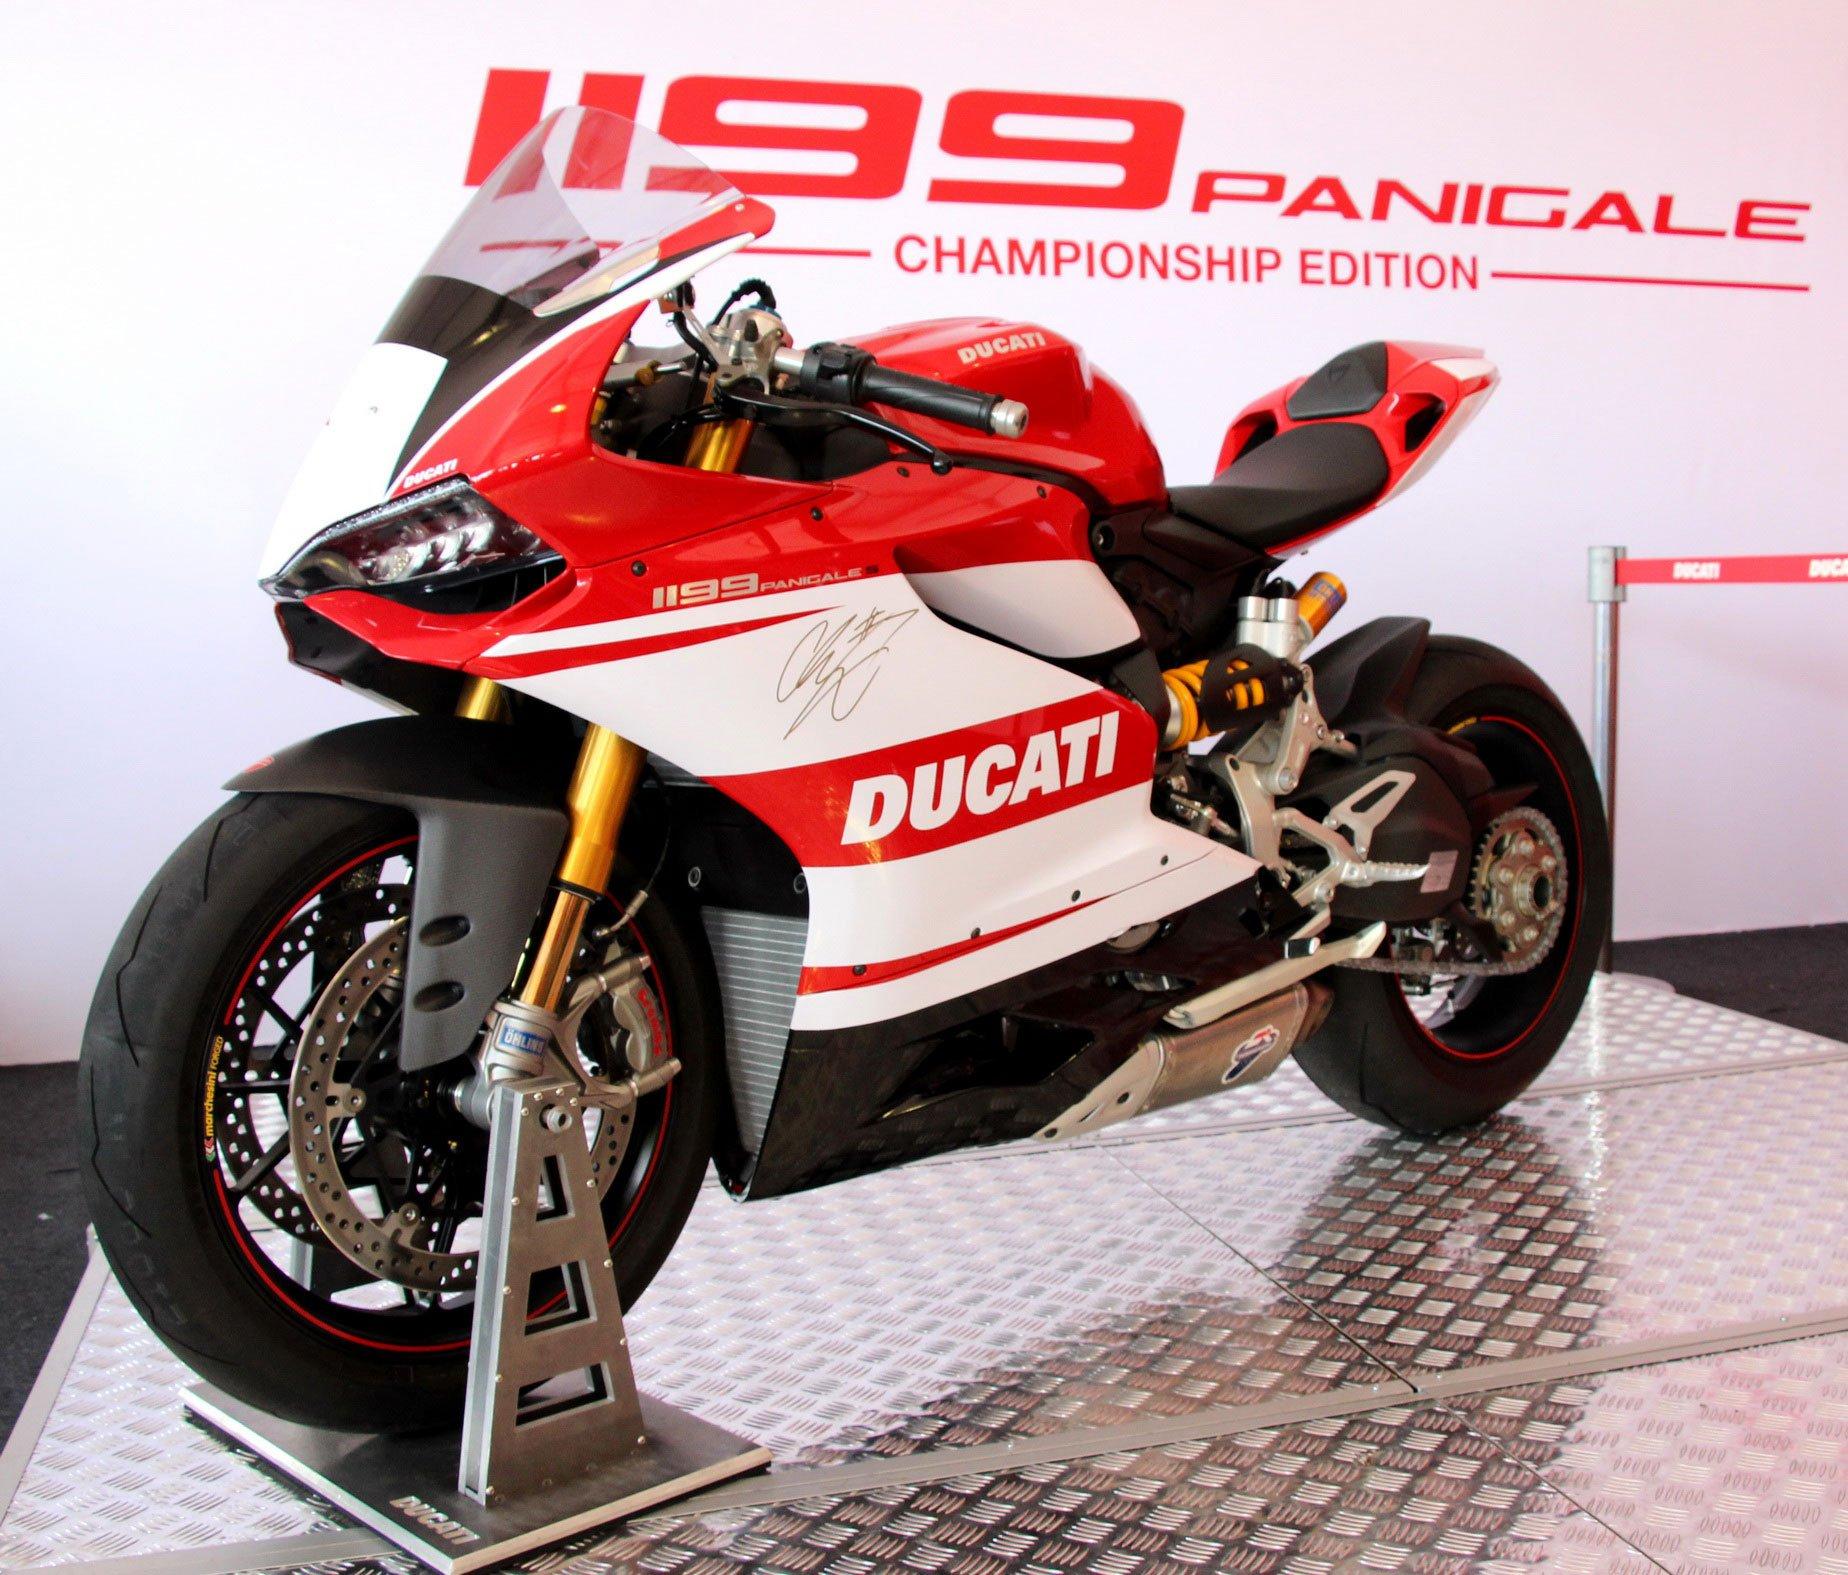 ducati 1199 panigale championship edition, 10 units